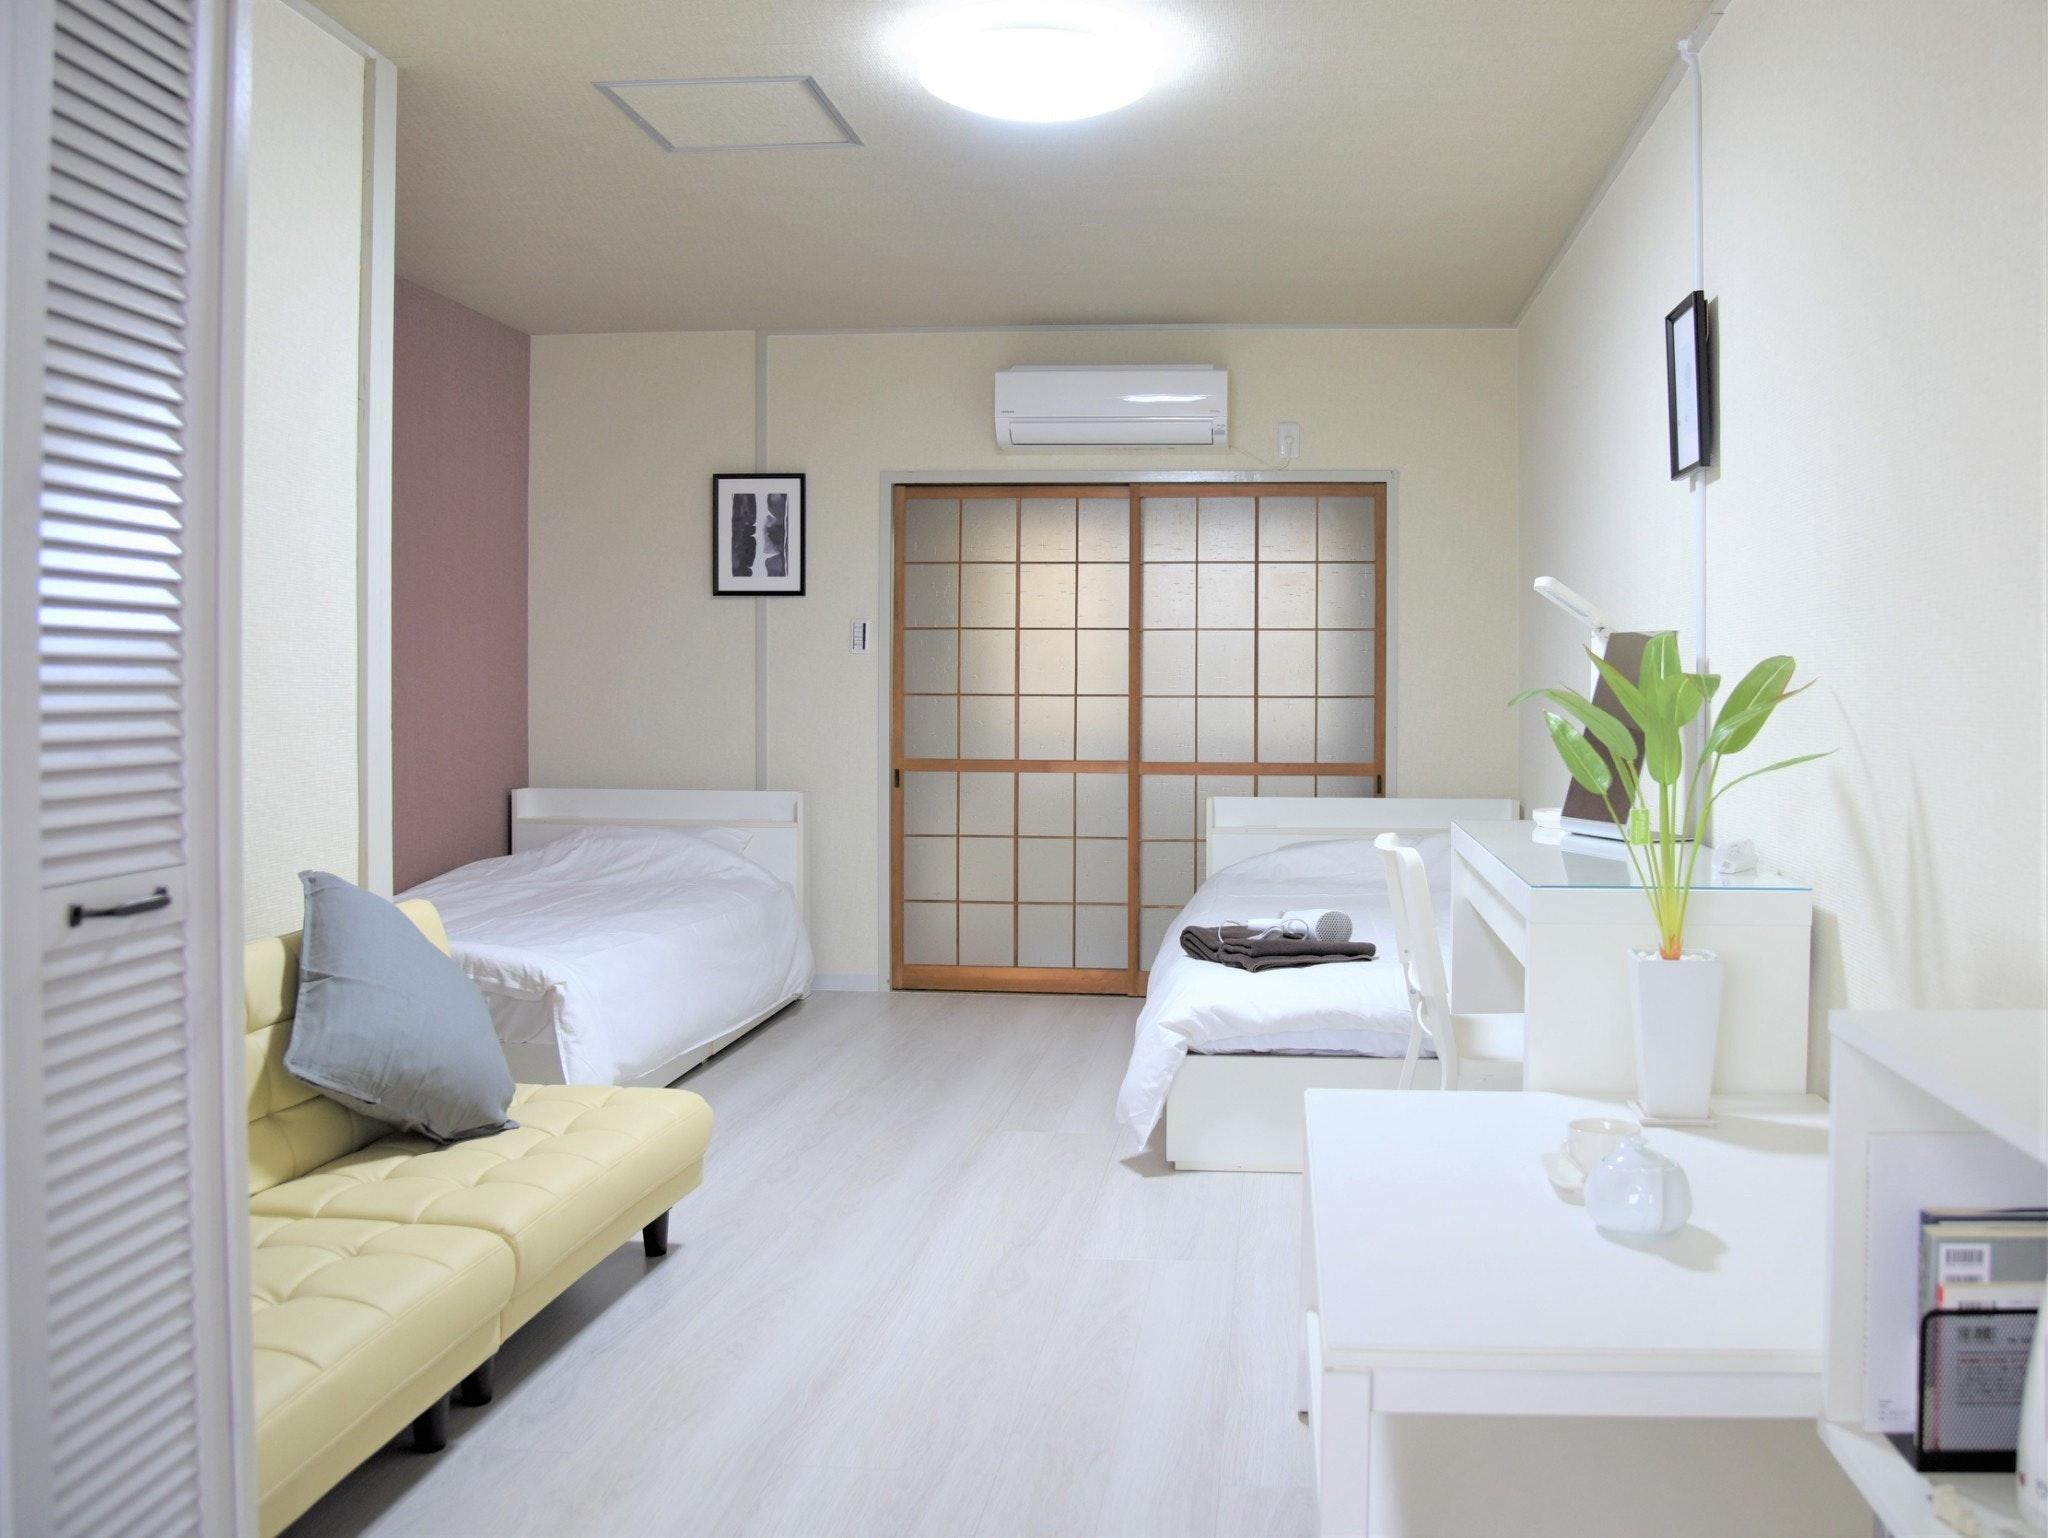 [AR2] 昔ながらの大阪の魅力な街にグランドオープン 観光地へのアクセス絶好 WIFI完備